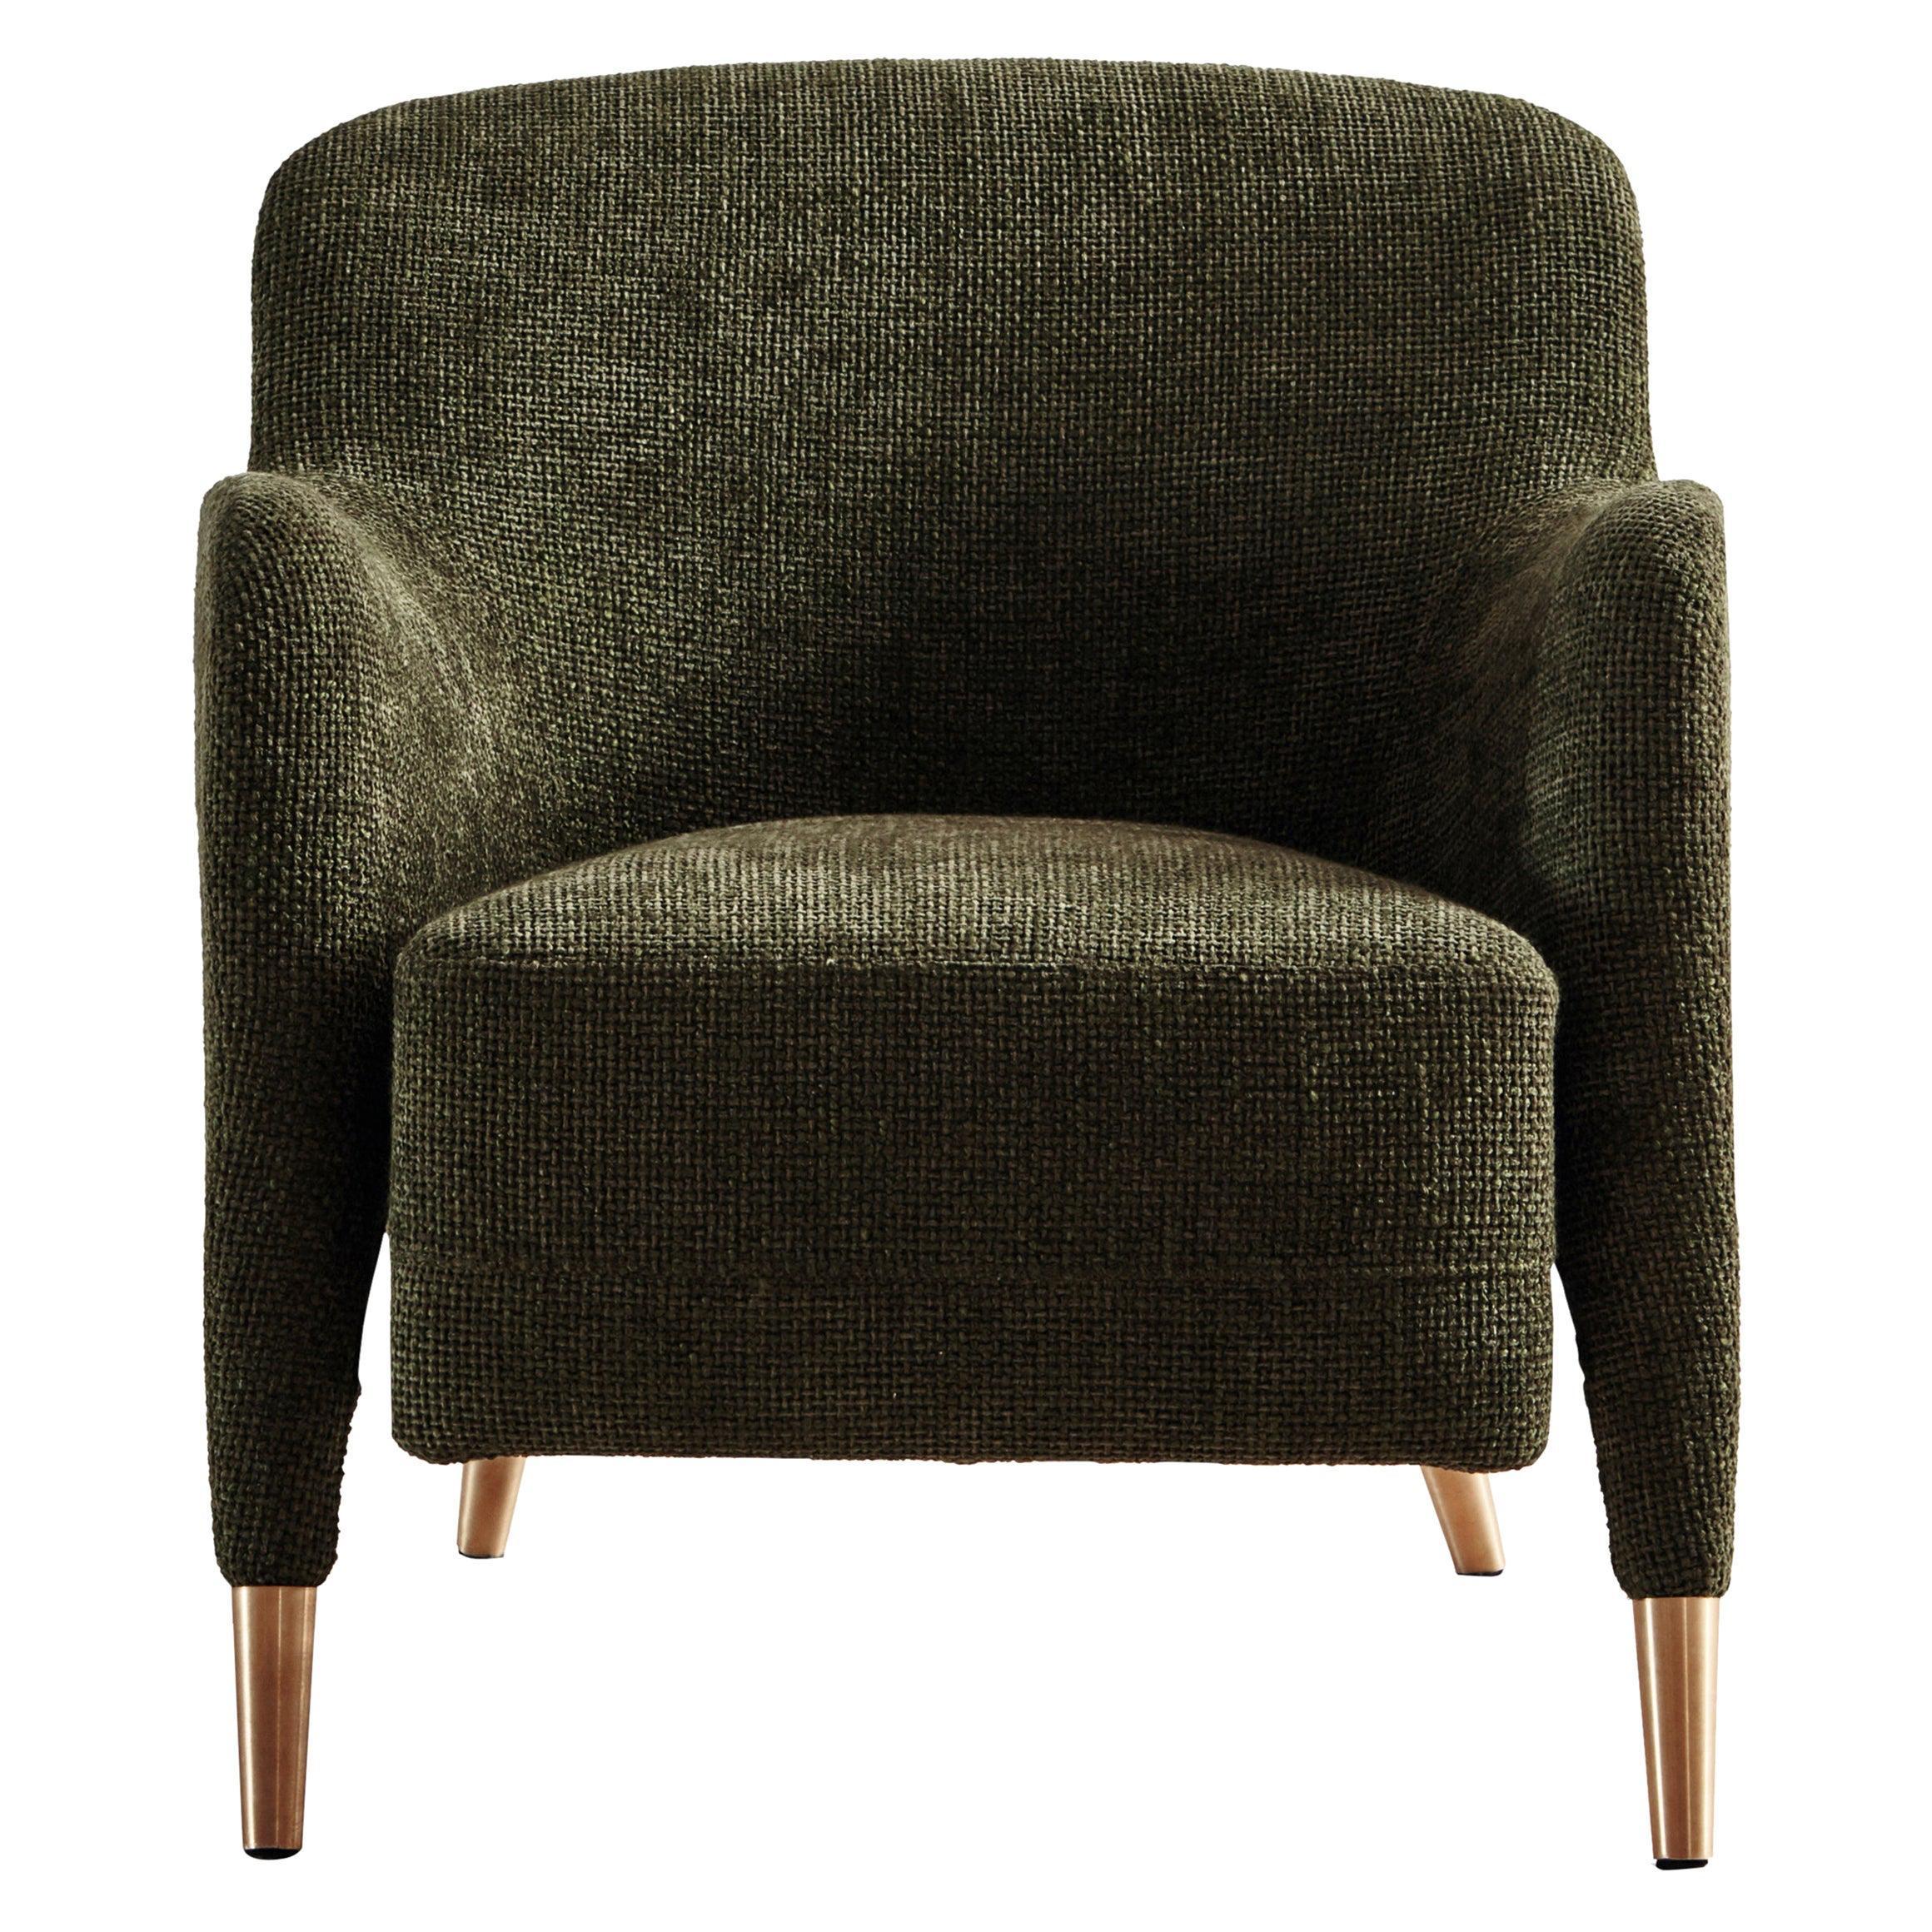 Molteni&C D.151.4 Armchair in Green Chenille Fabric by Gio Ponti